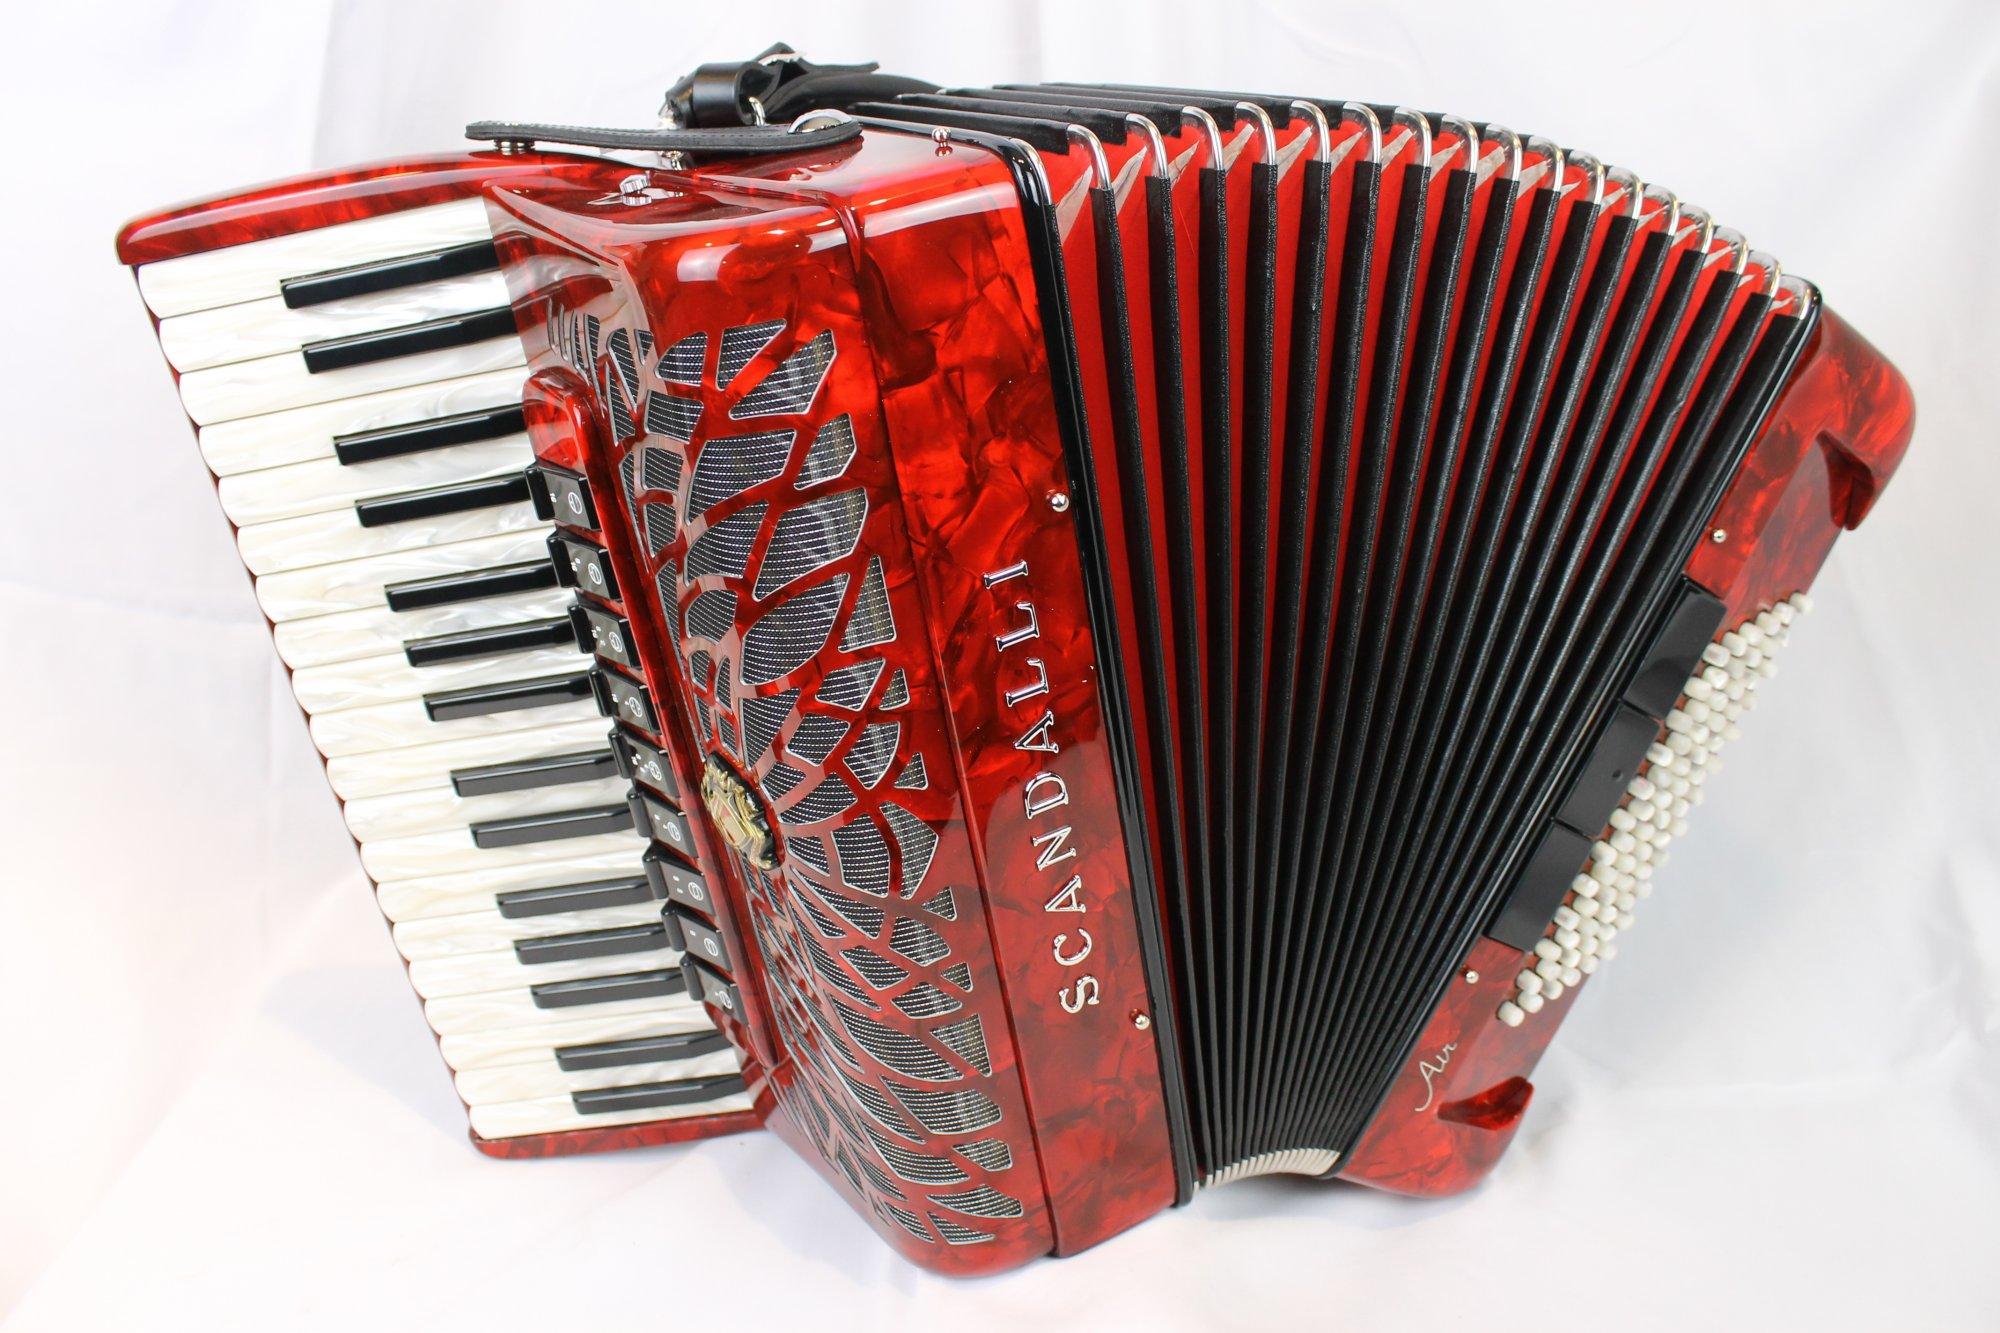 NEW Red Scandalli Air Junior Piano Accordion LMMM 34 72